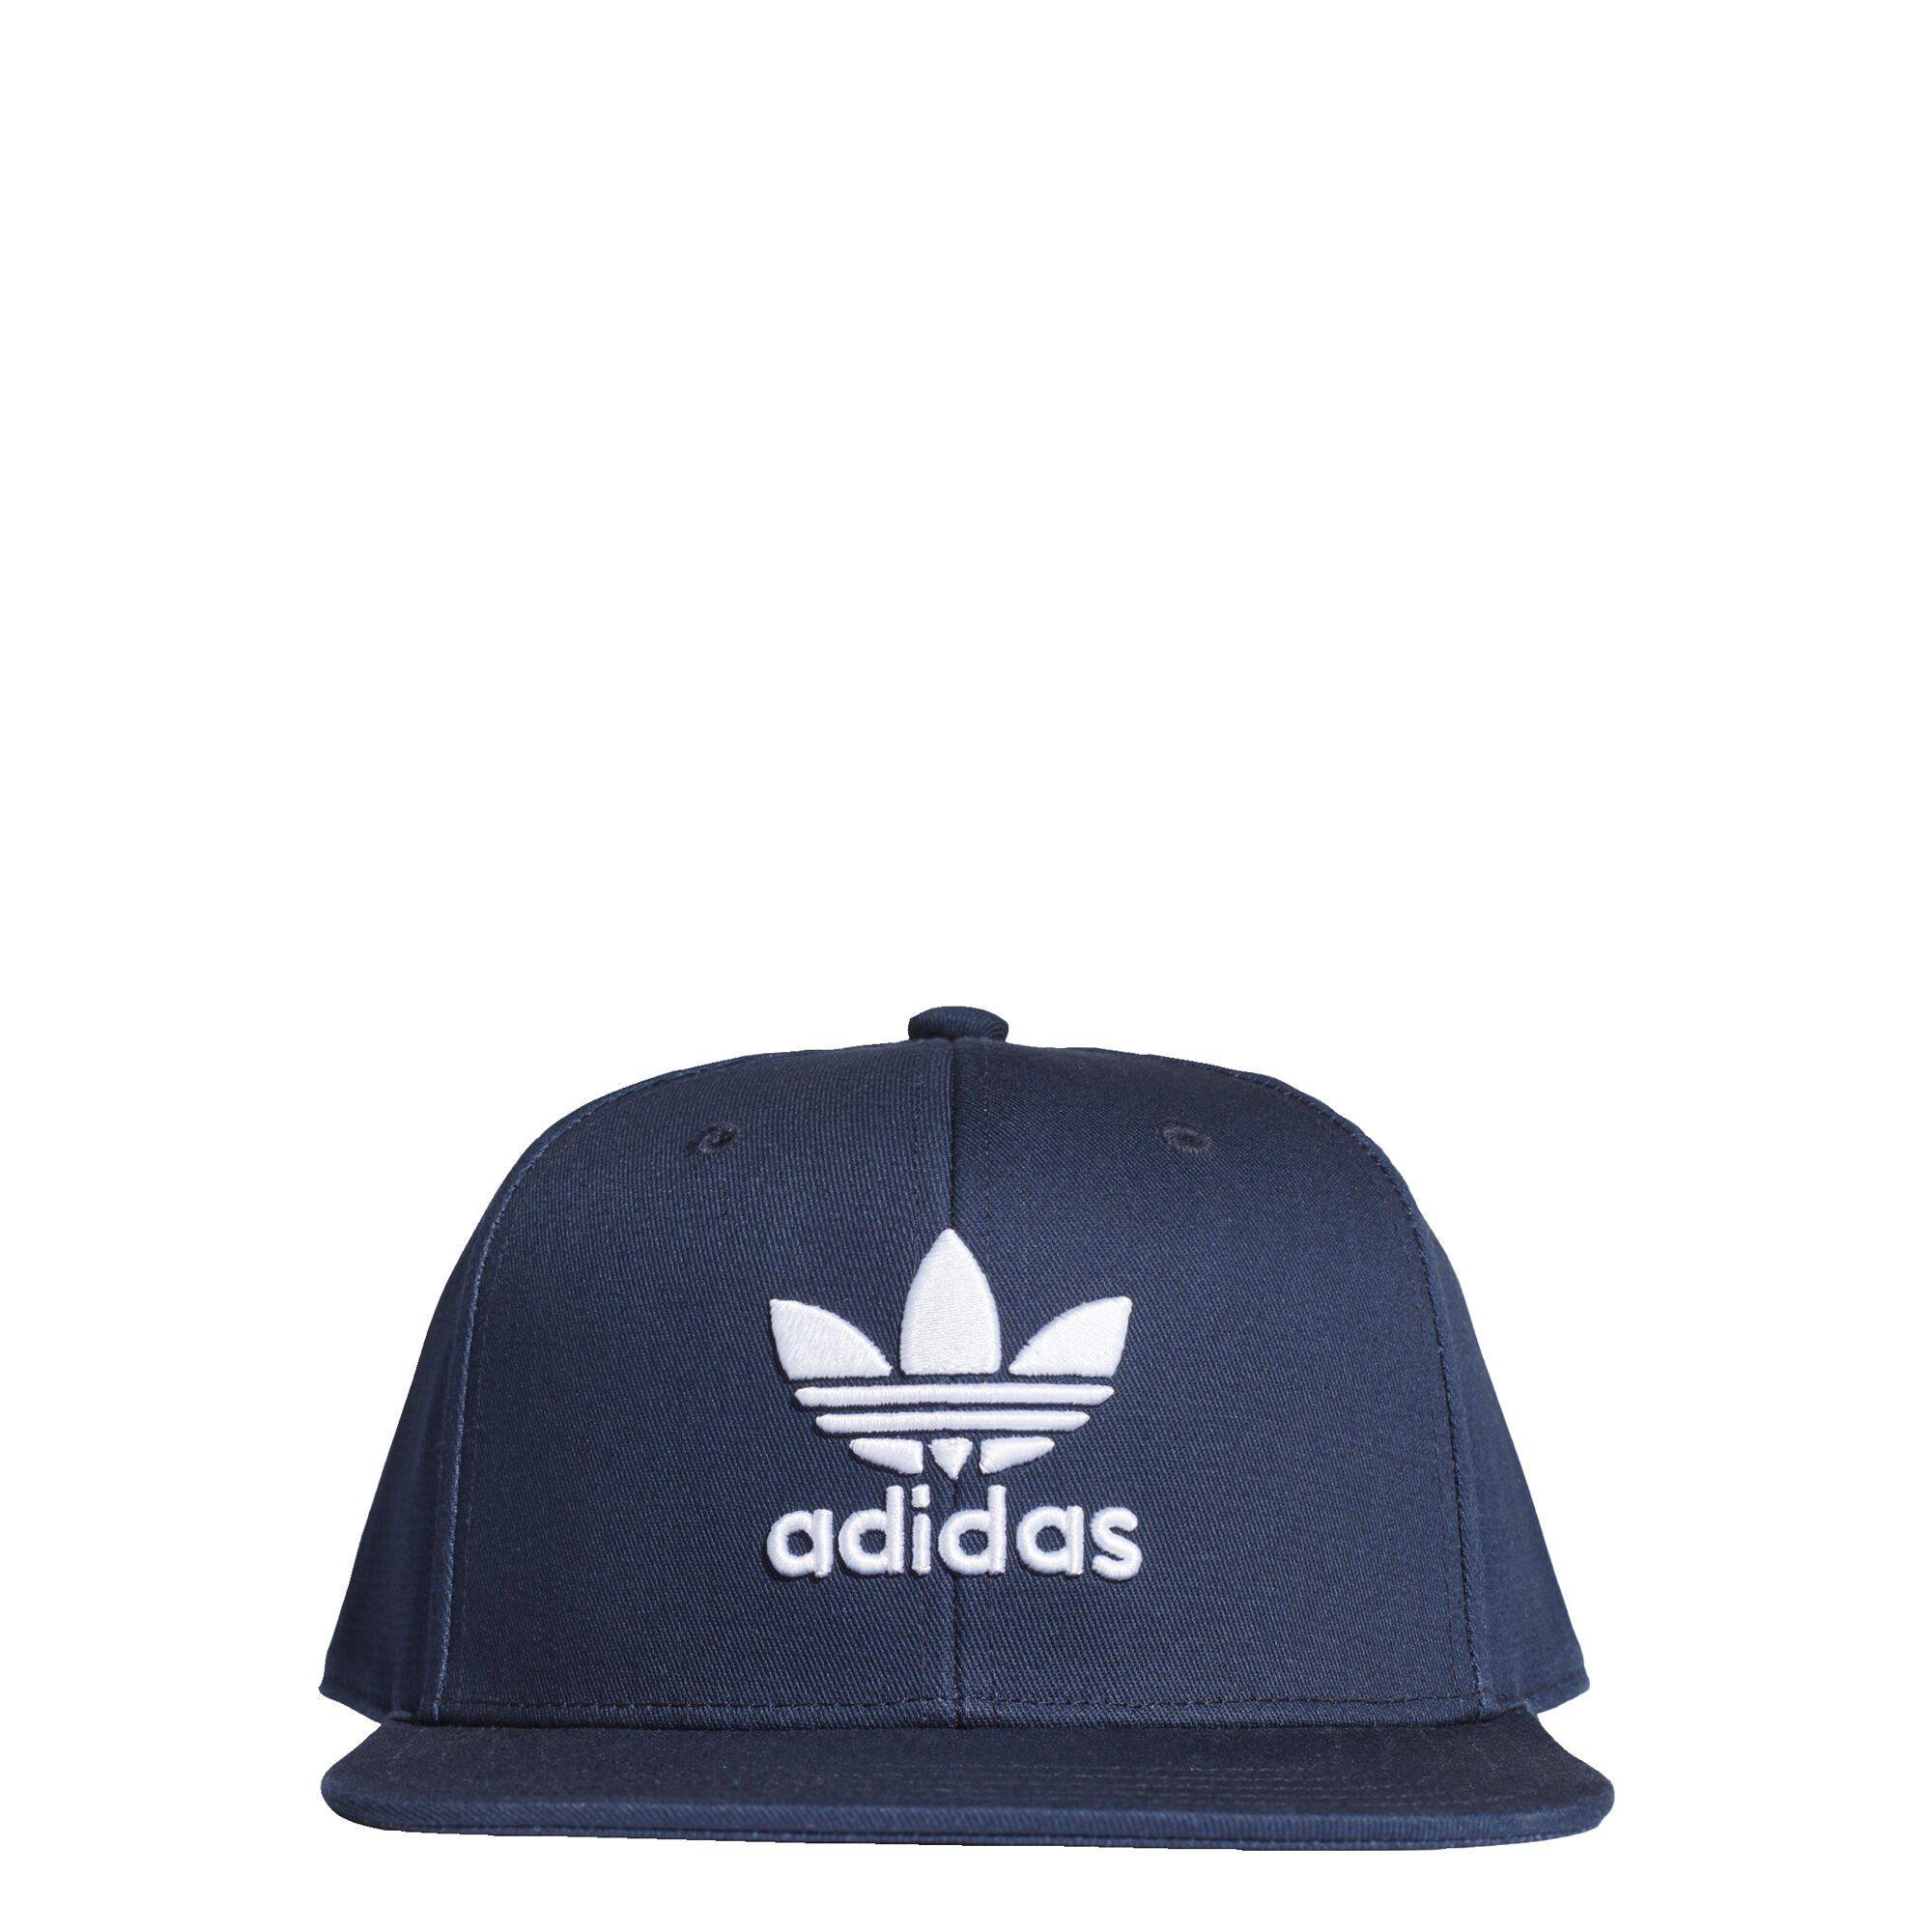 adidas Originals Snapback Cap »Snapback Trefoil Kappe« adicolor online kaufen   OTTO